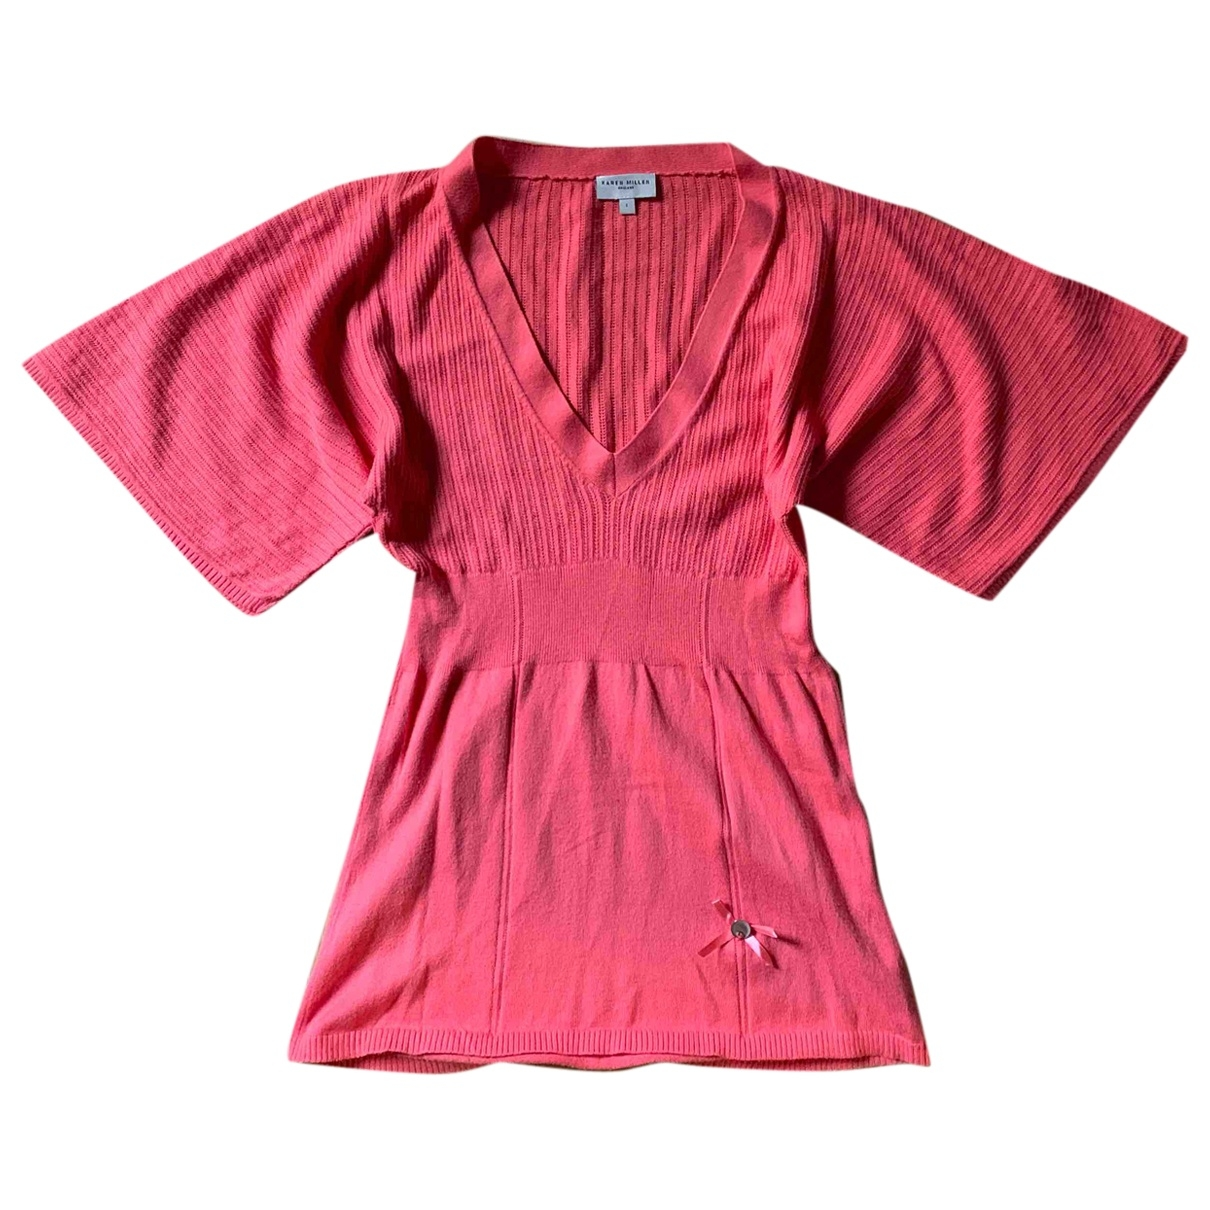 Karen Millen \N Orange Cotton Knitwear for Women 8 UK